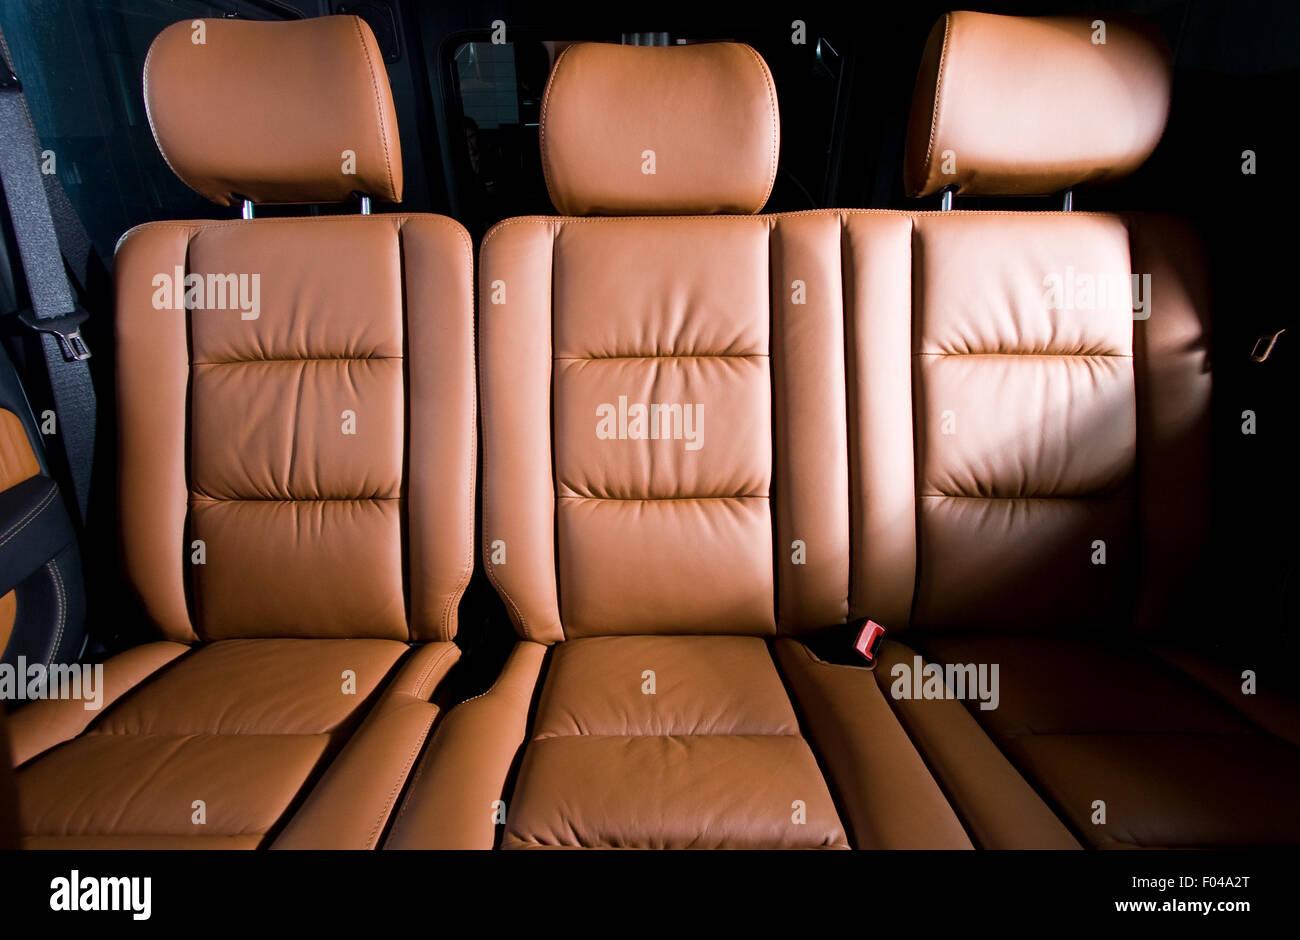 back passenger seats in modern comfortable car stock photo royalty free image 86147568 alamy. Black Bedroom Furniture Sets. Home Design Ideas